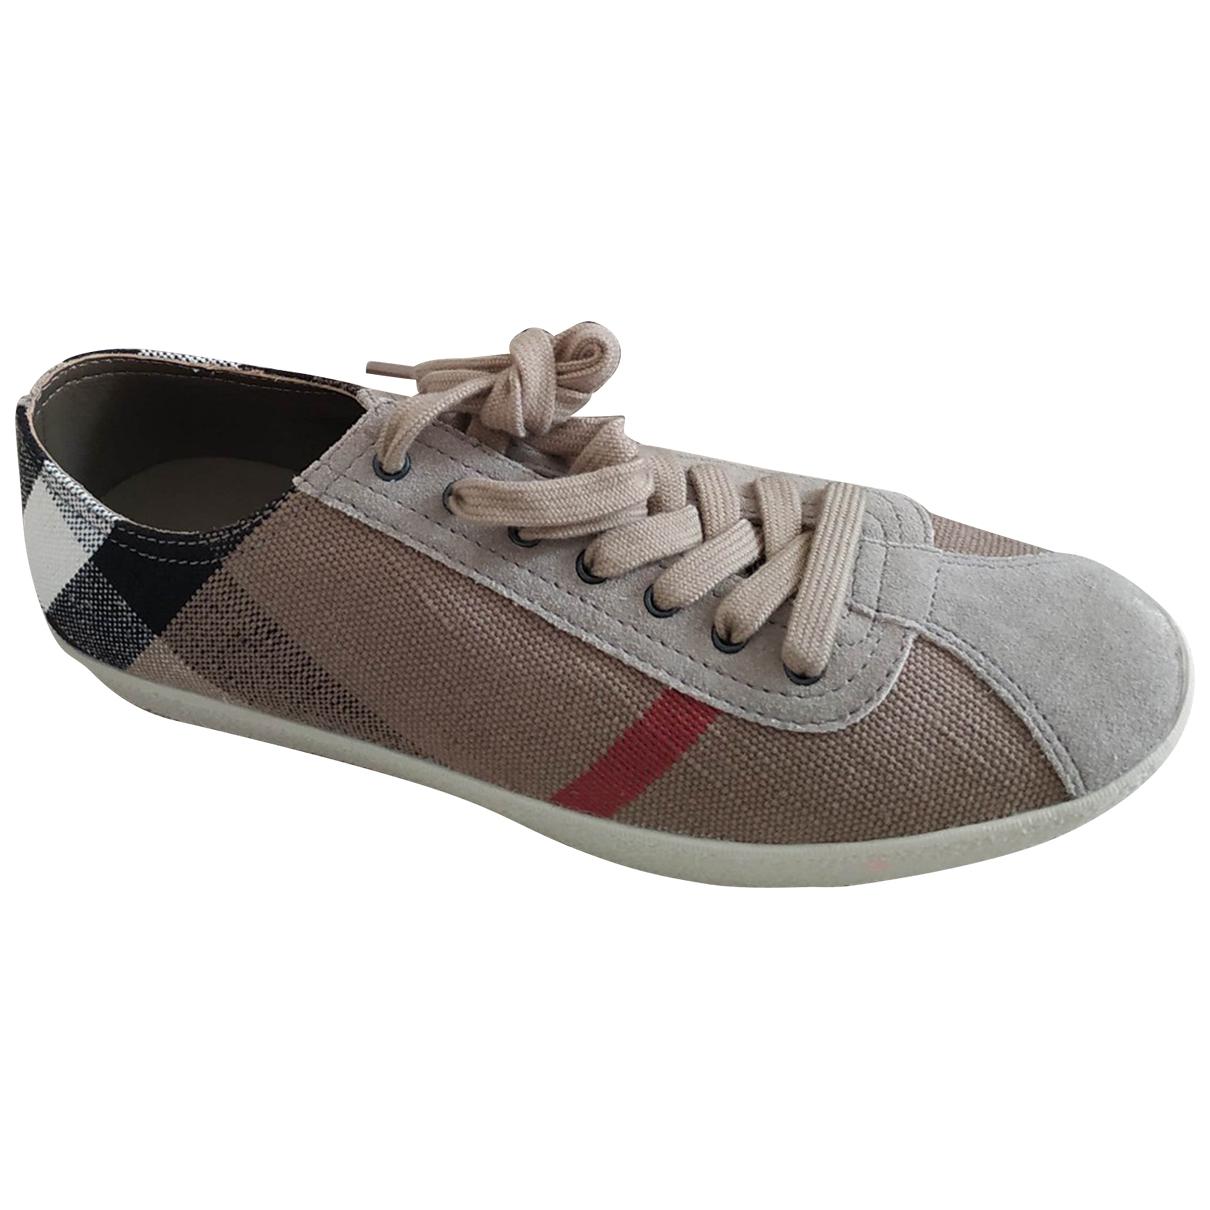 Burberry \N Sneakers in  Kamel Leinen